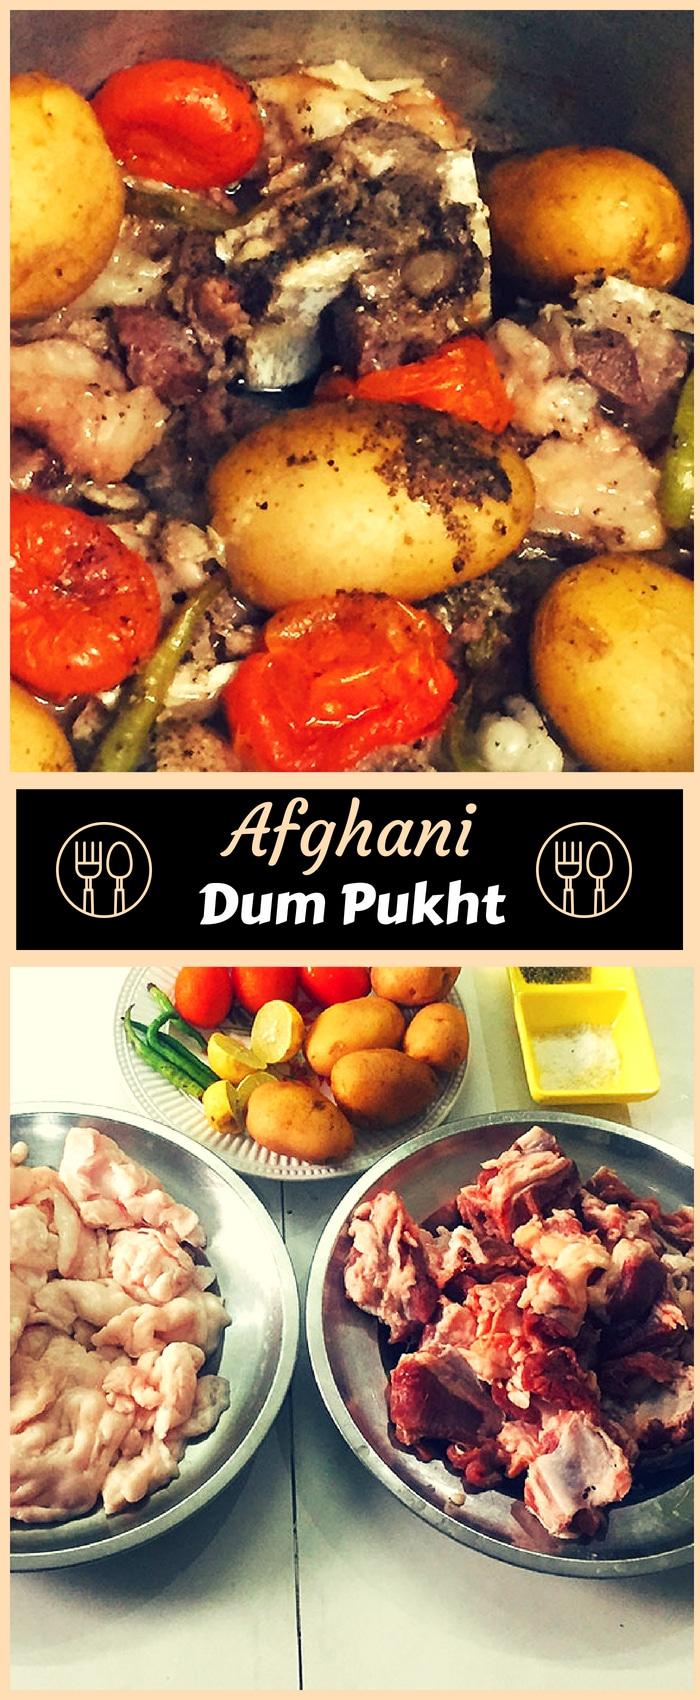 Afghani Dum Pukht